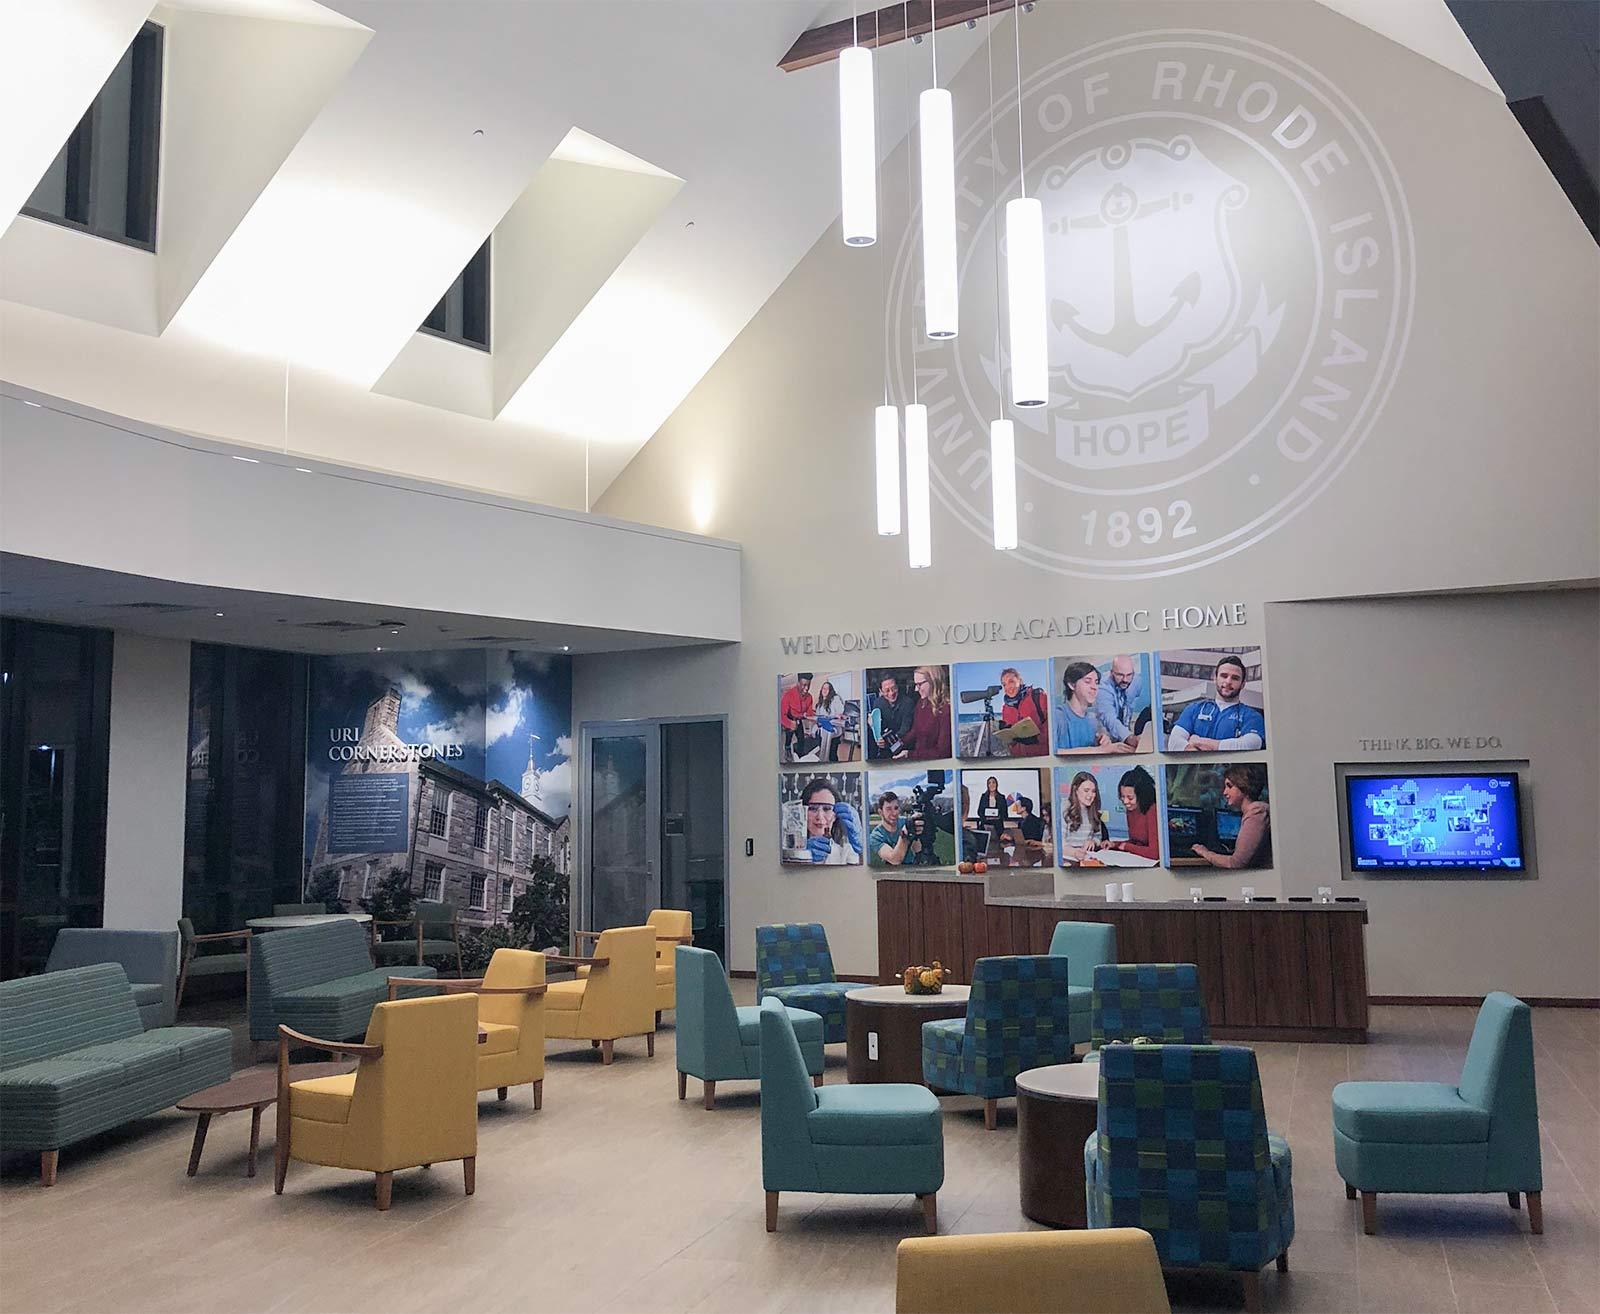 University of Rhode Island Facility